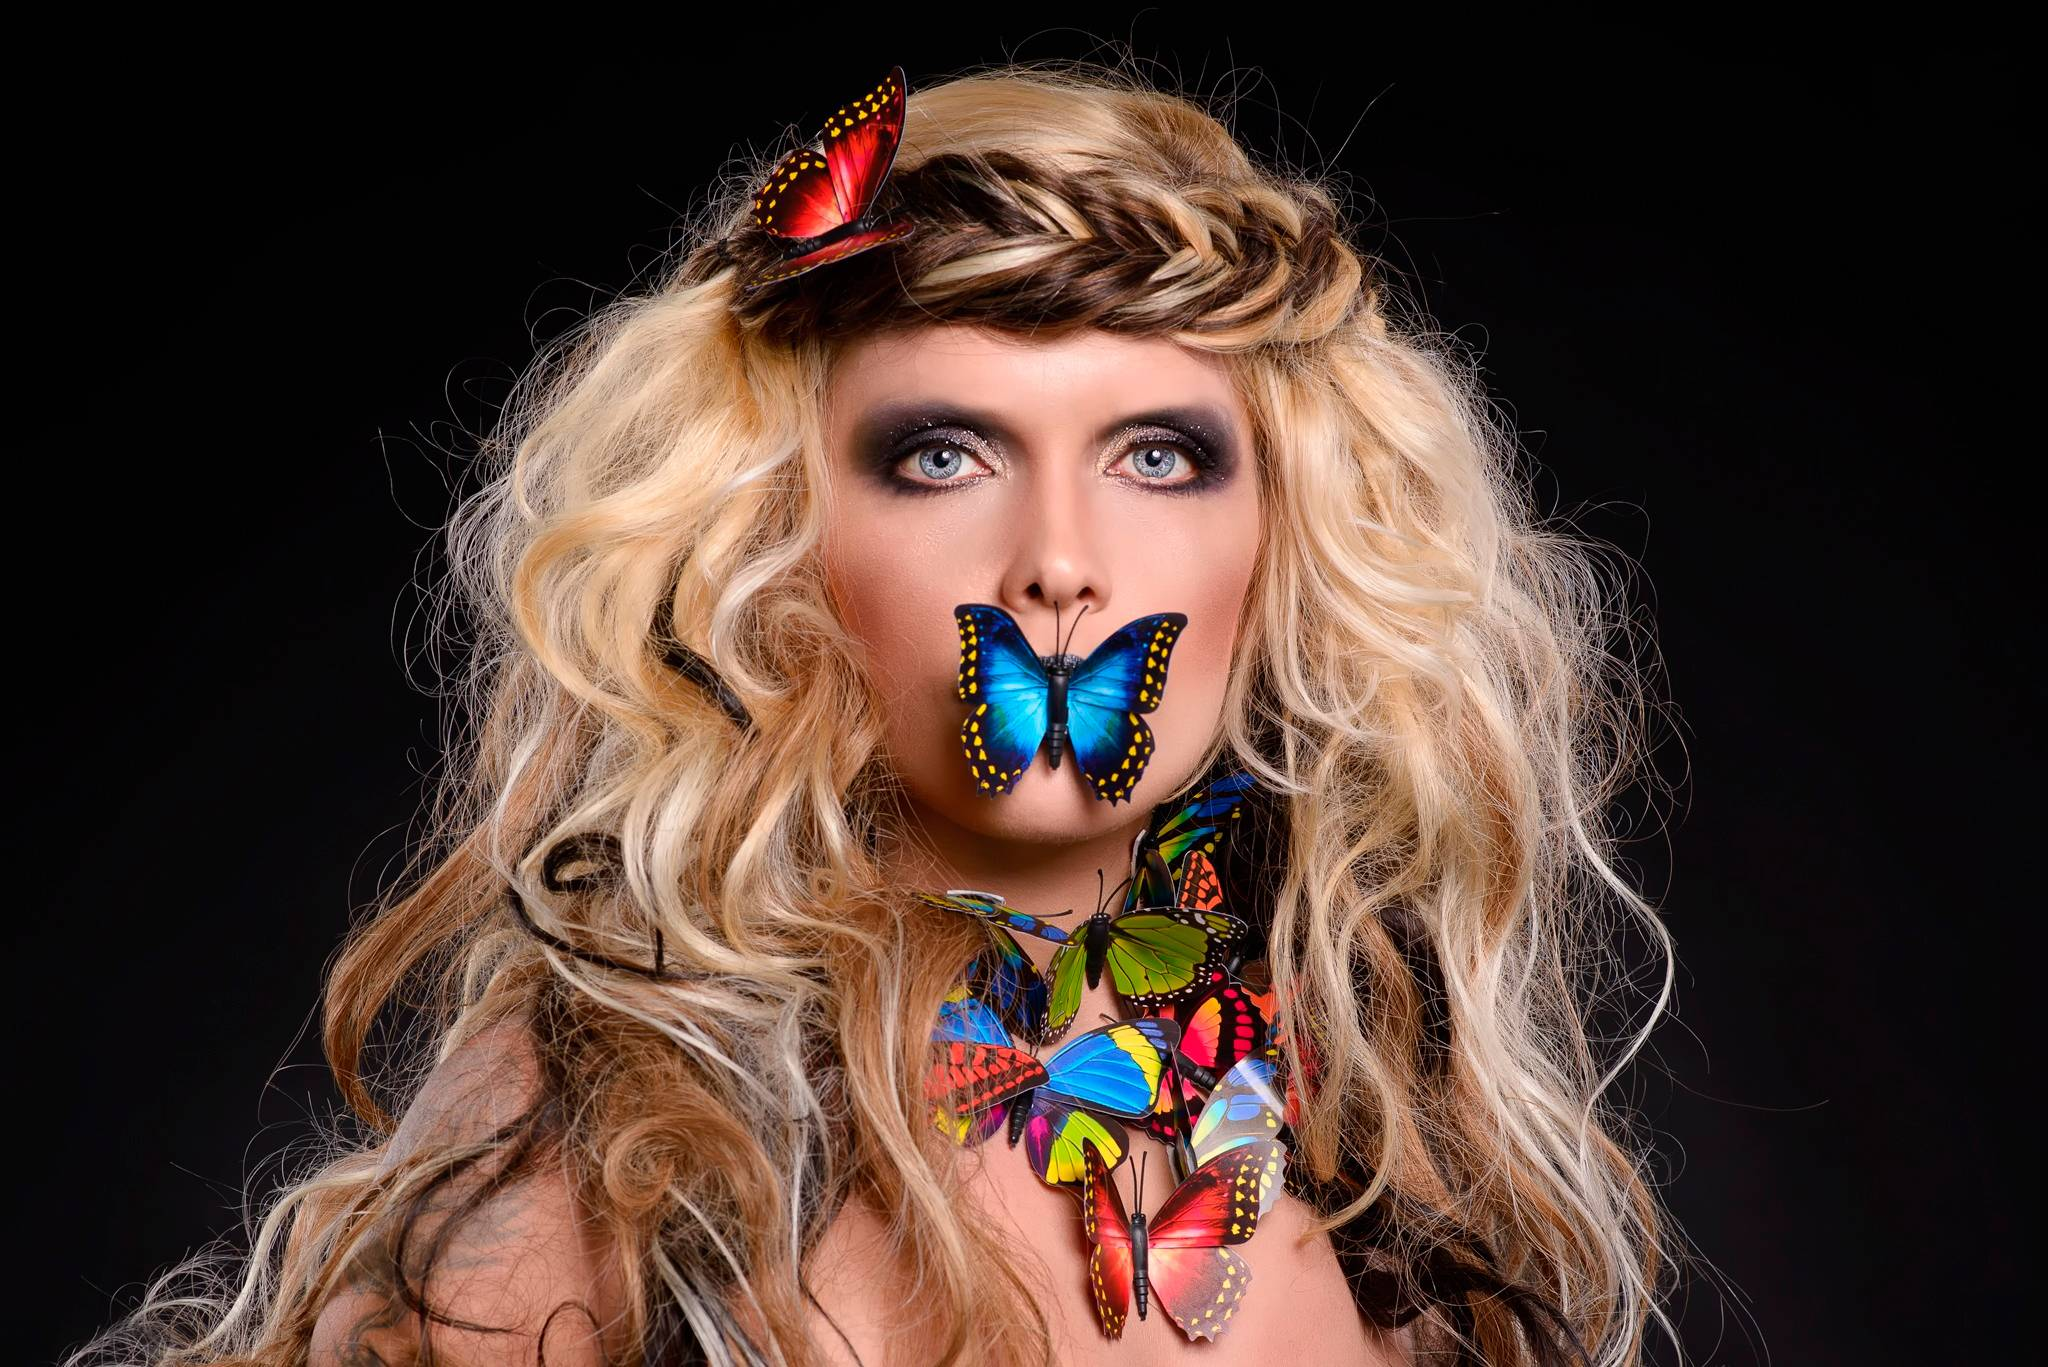 Обои бабочки, портрет, по мотивам фильма, фантазия